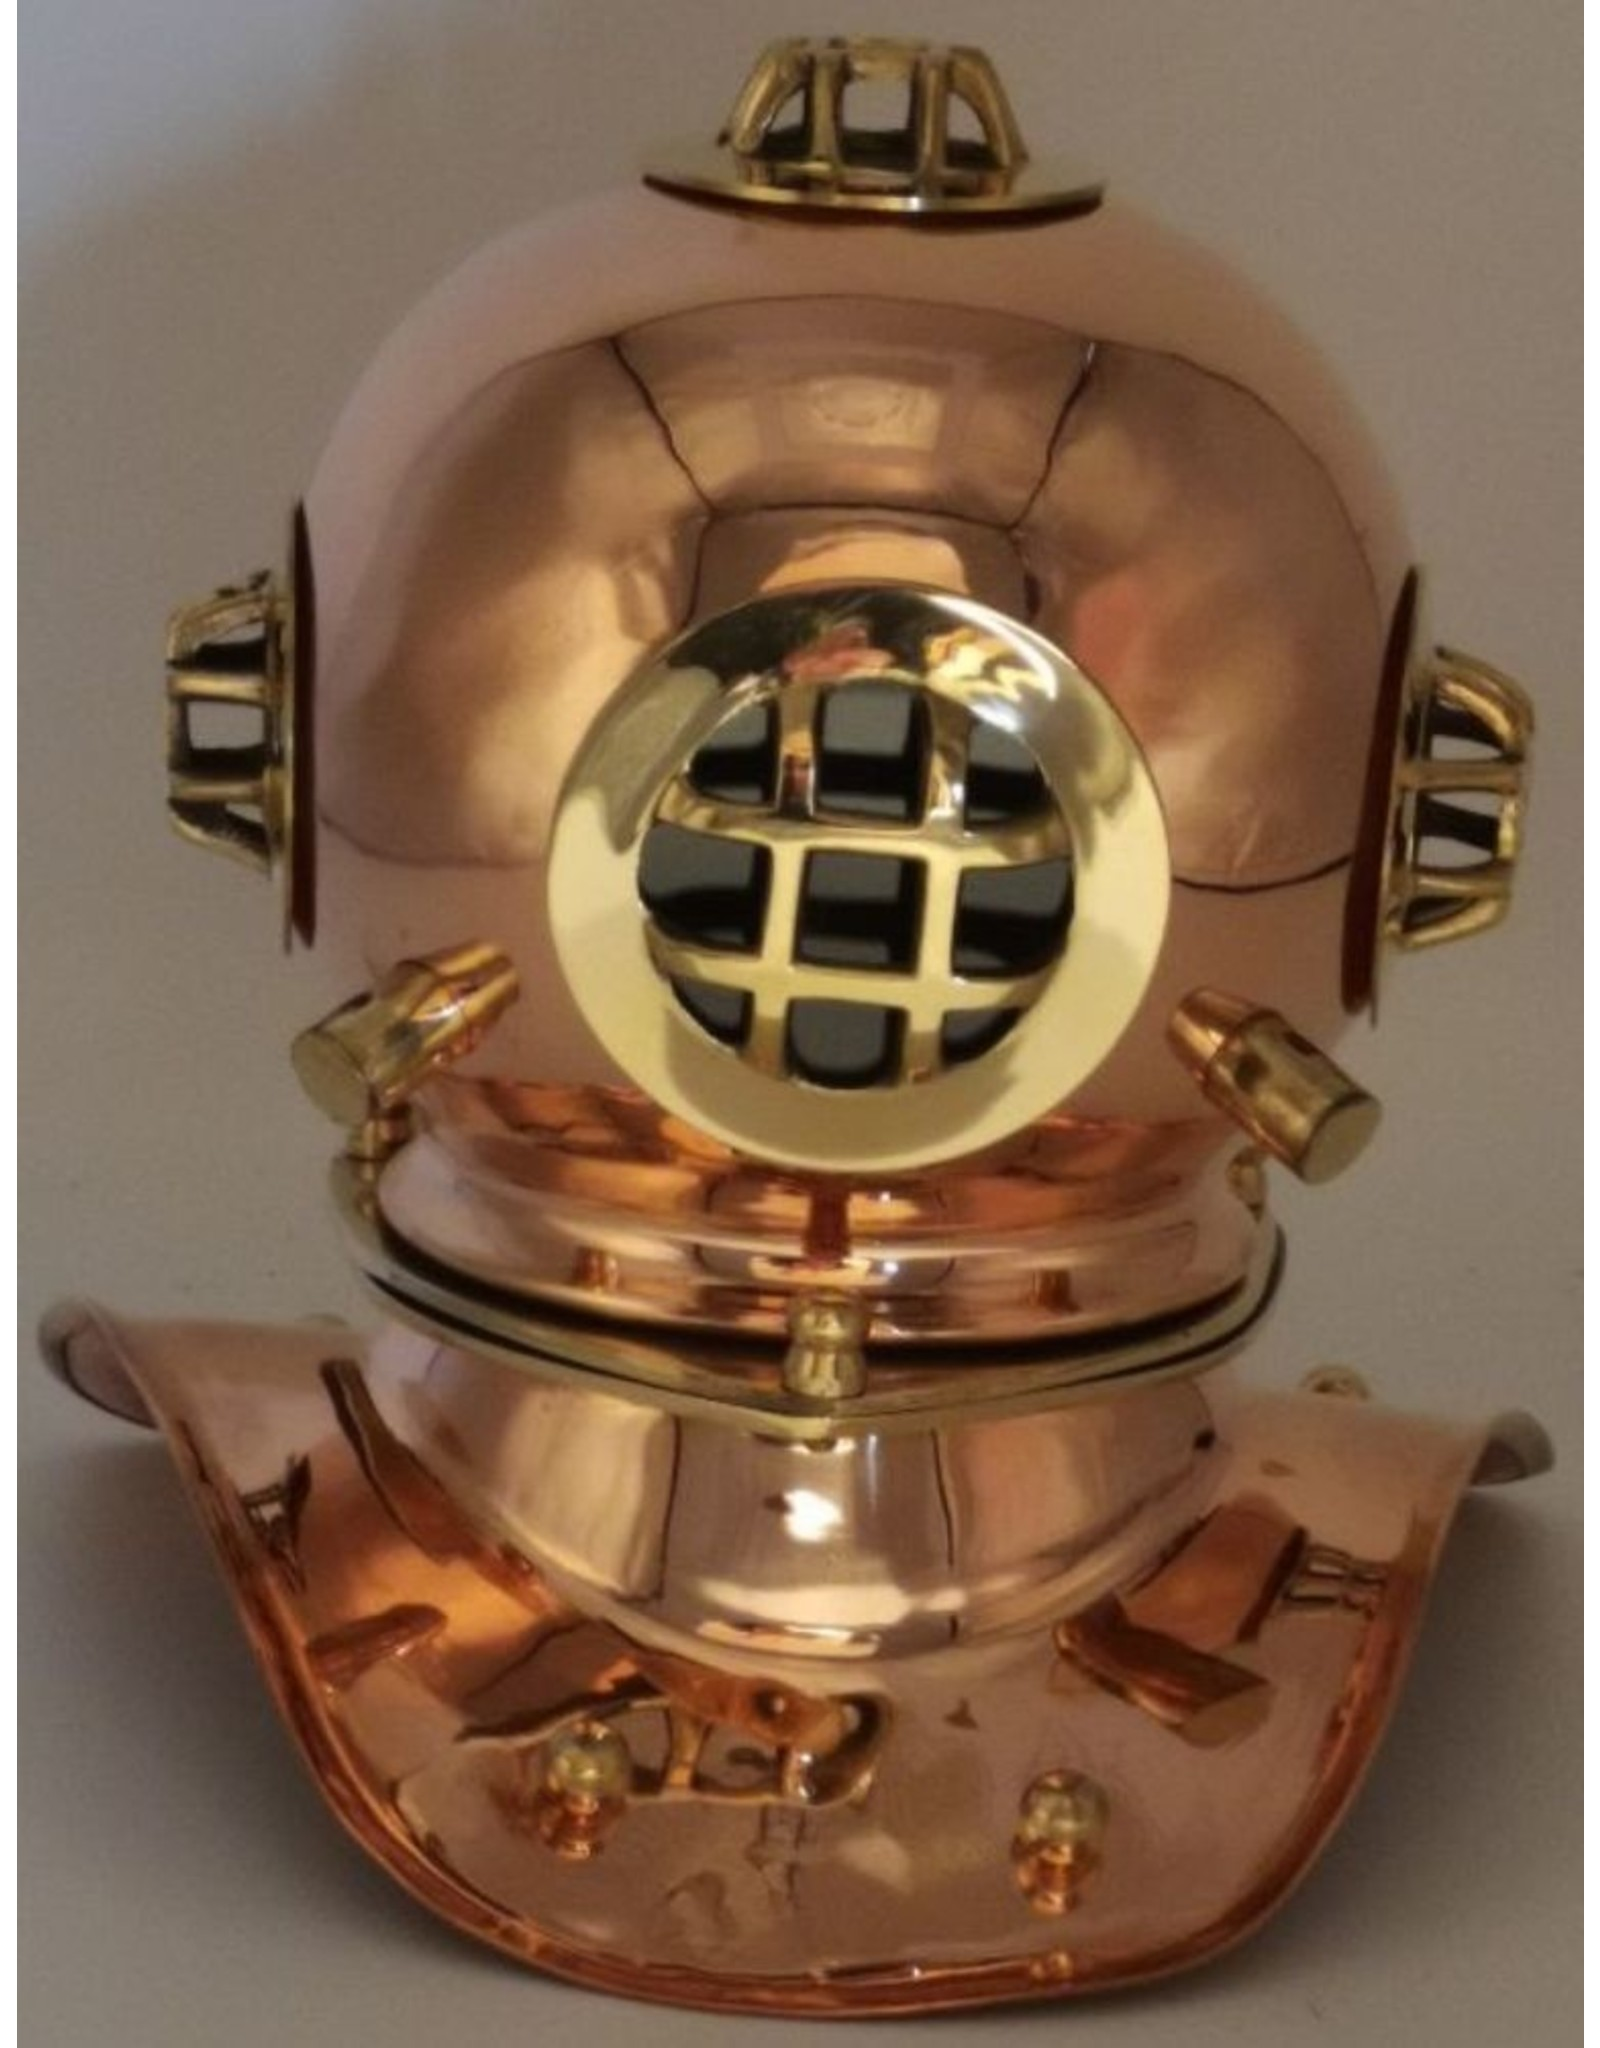 Trukado Giftware & Lifestyle - Diving helmet home decoration - copper